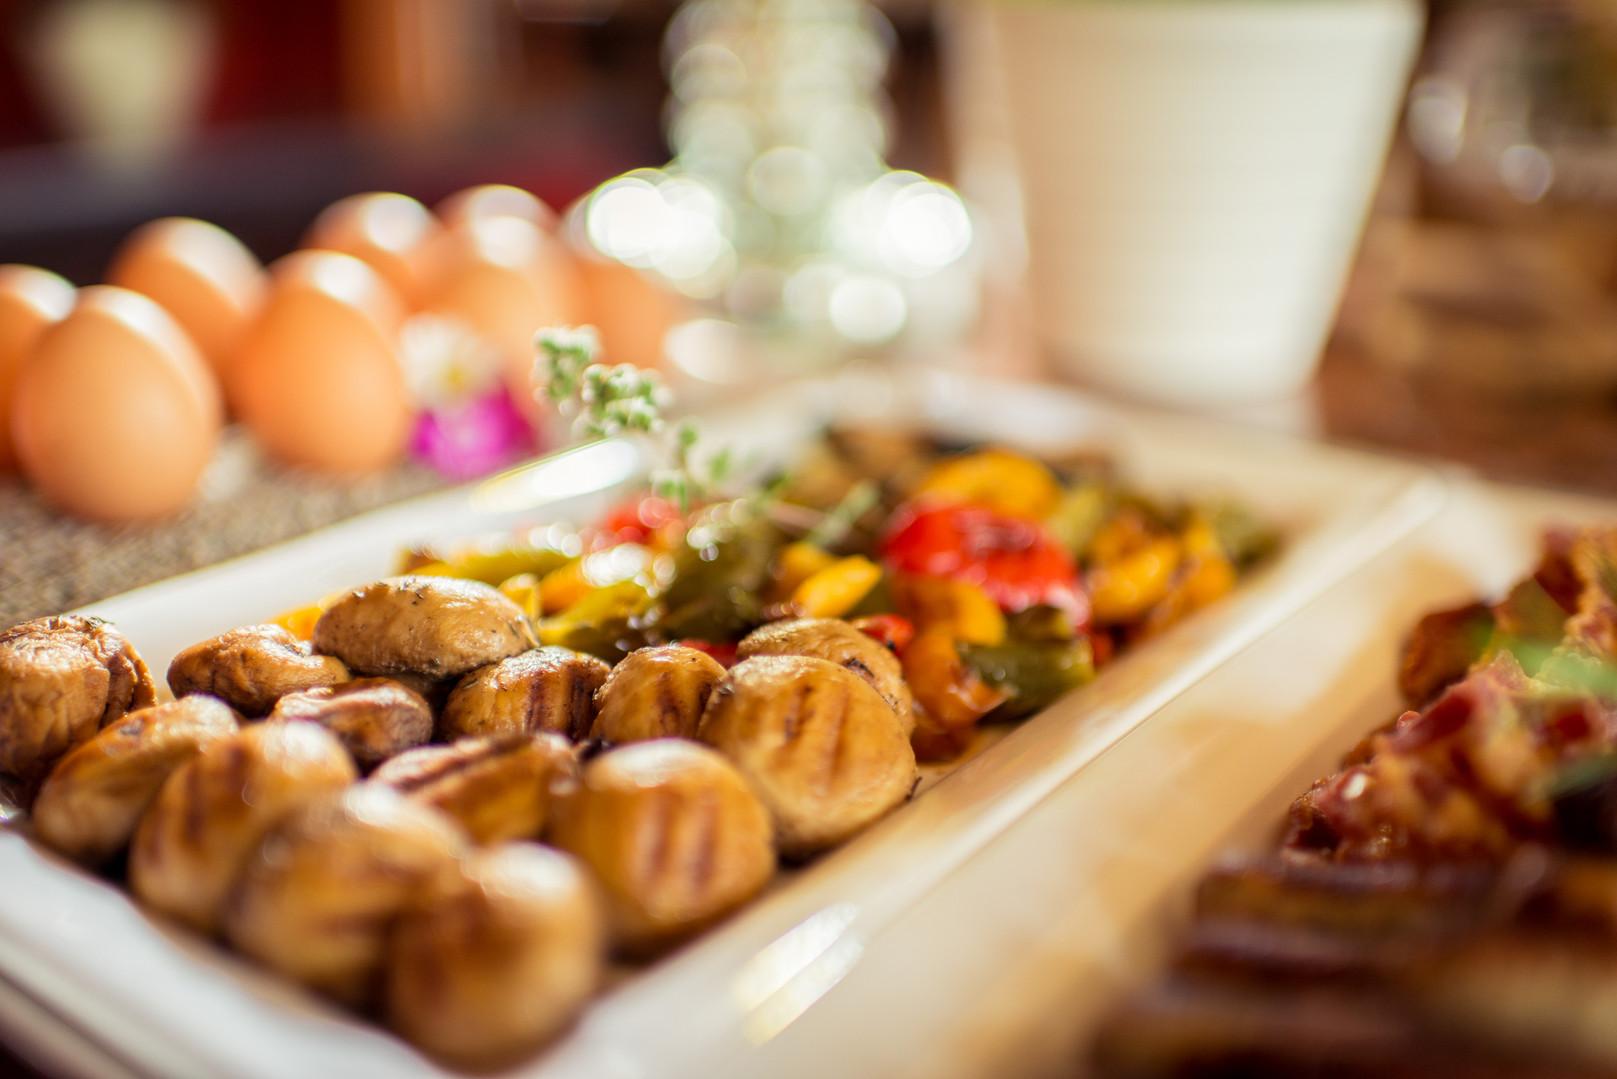 Frikadellen im Hotel Wegner - the culinary art hotel